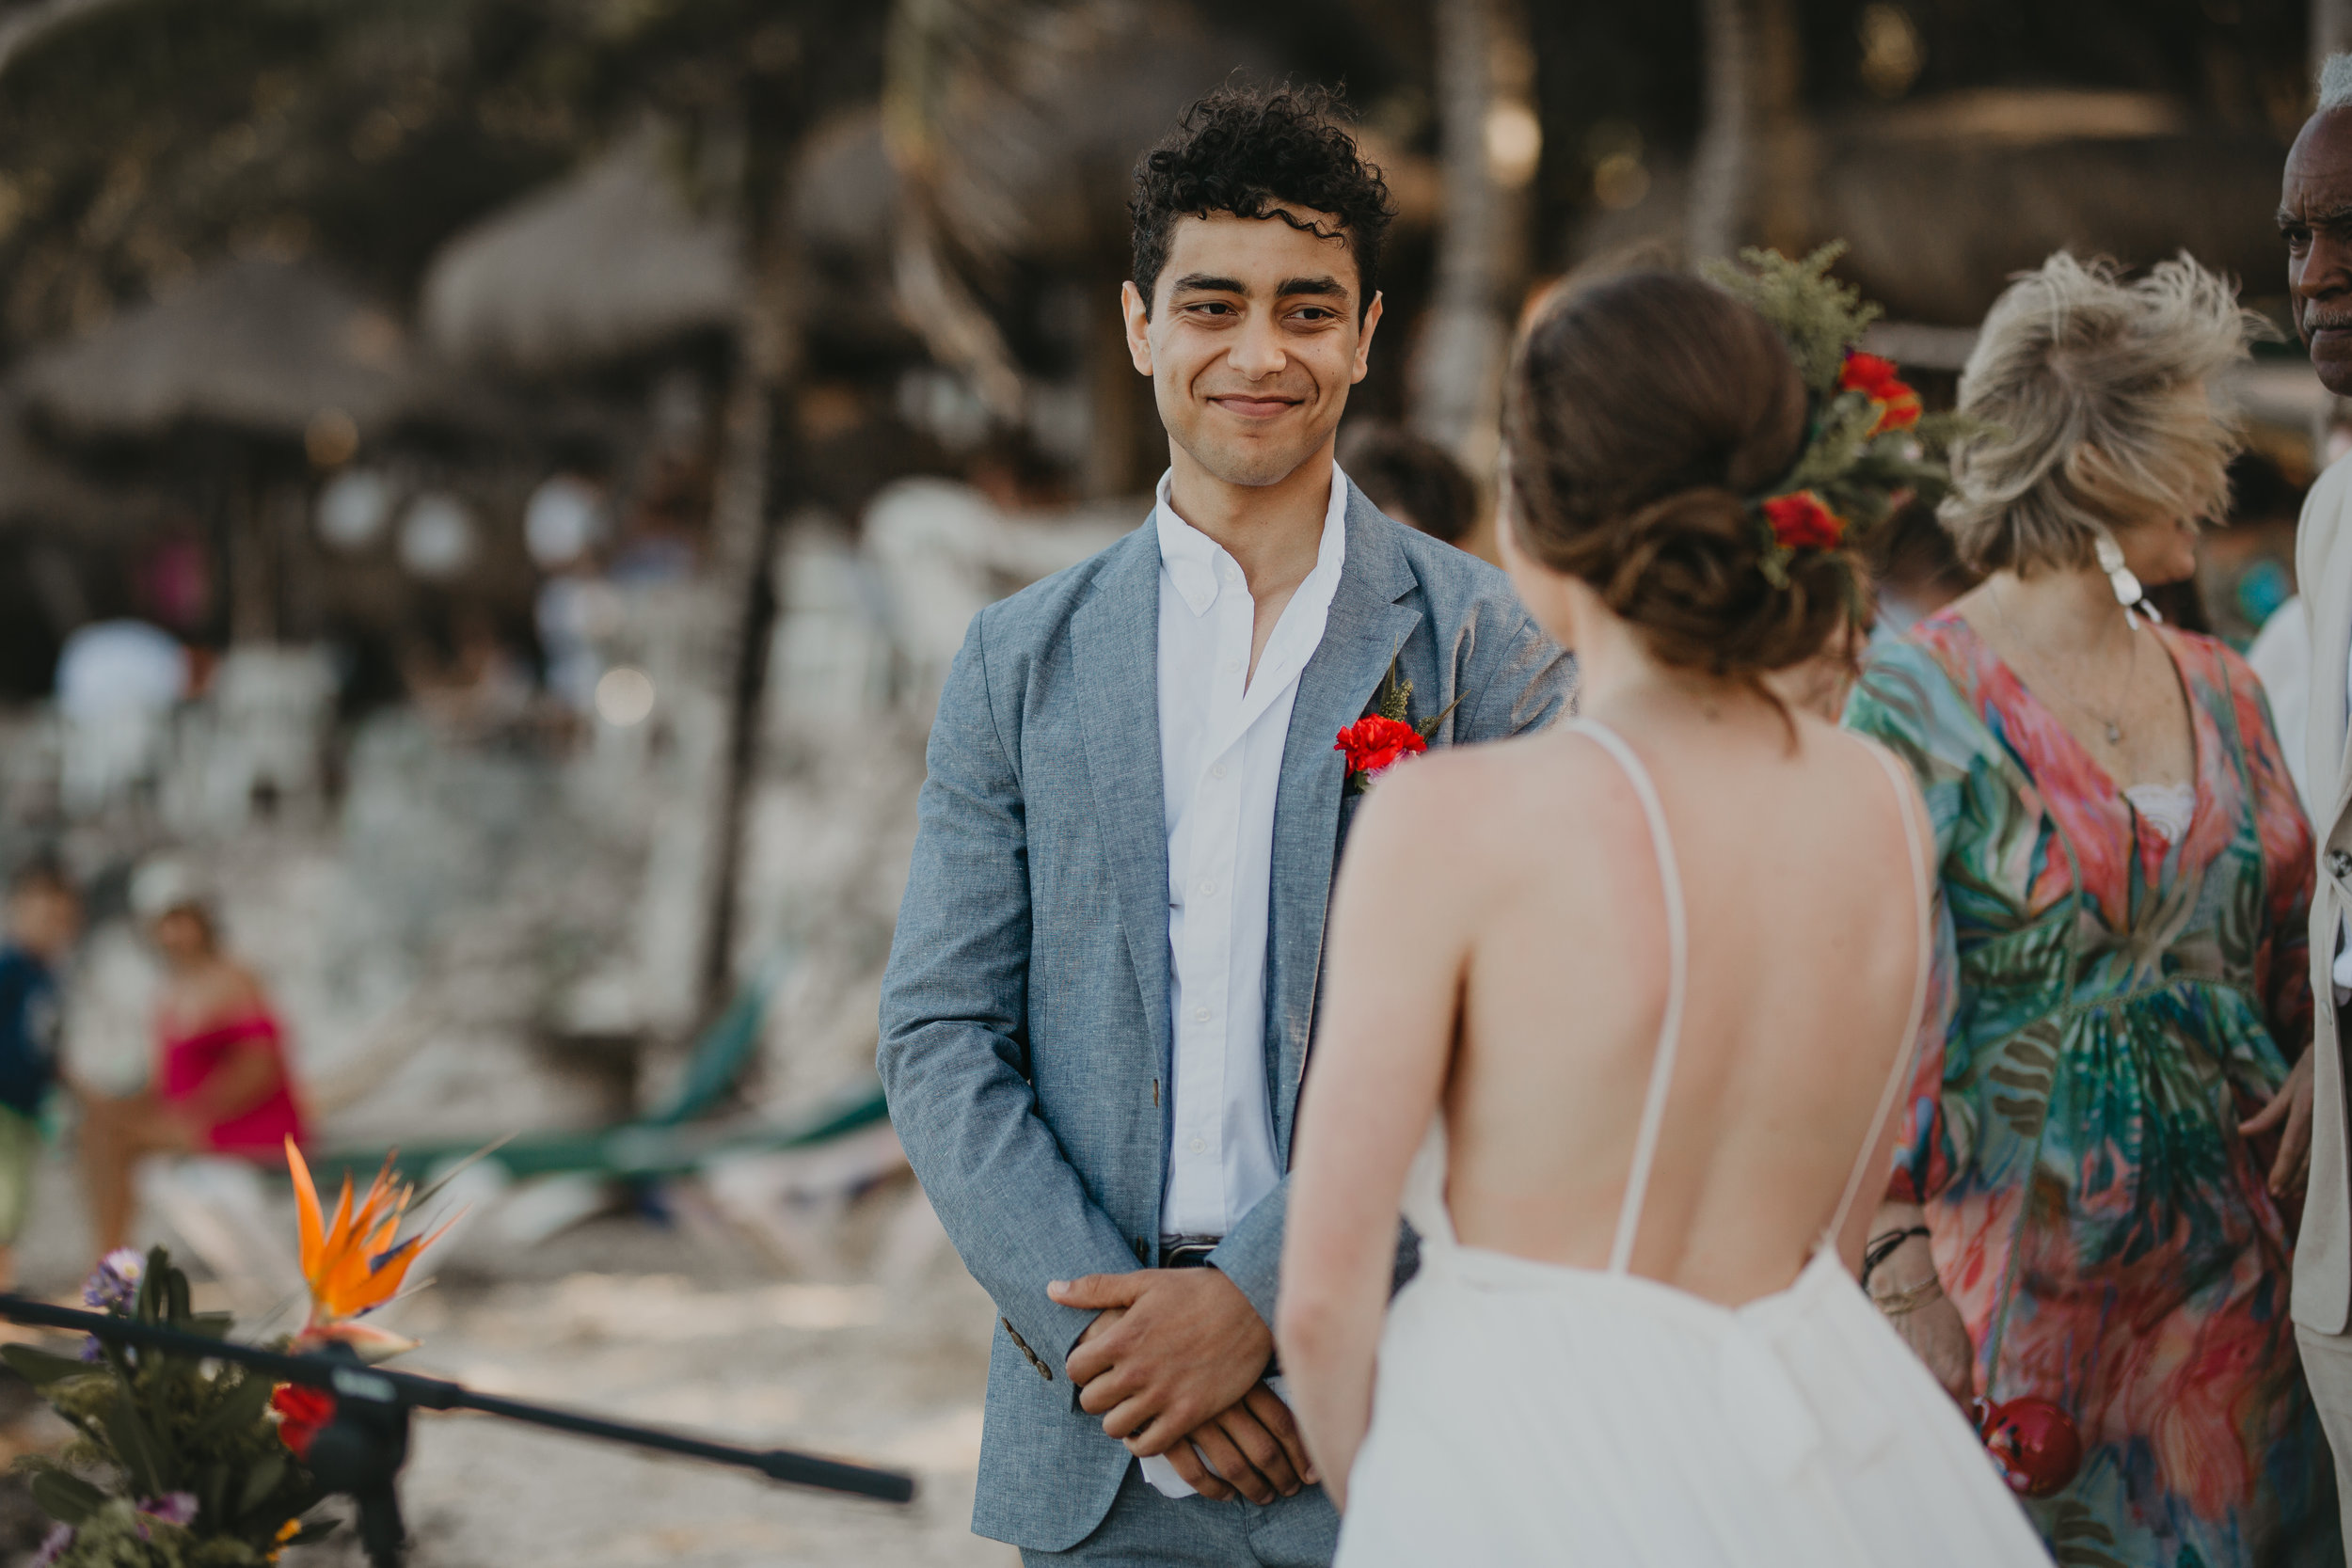 Nicole-Daacke-Photography-beachfront-akumal-destionation-wedding-tulum-mexico-elopement-photographer-destination-wedding-inspiration-sunset-champagne-pop-boho-bride-ocean-tropical-bohemian-tulum-wedding-photos-159.jpg